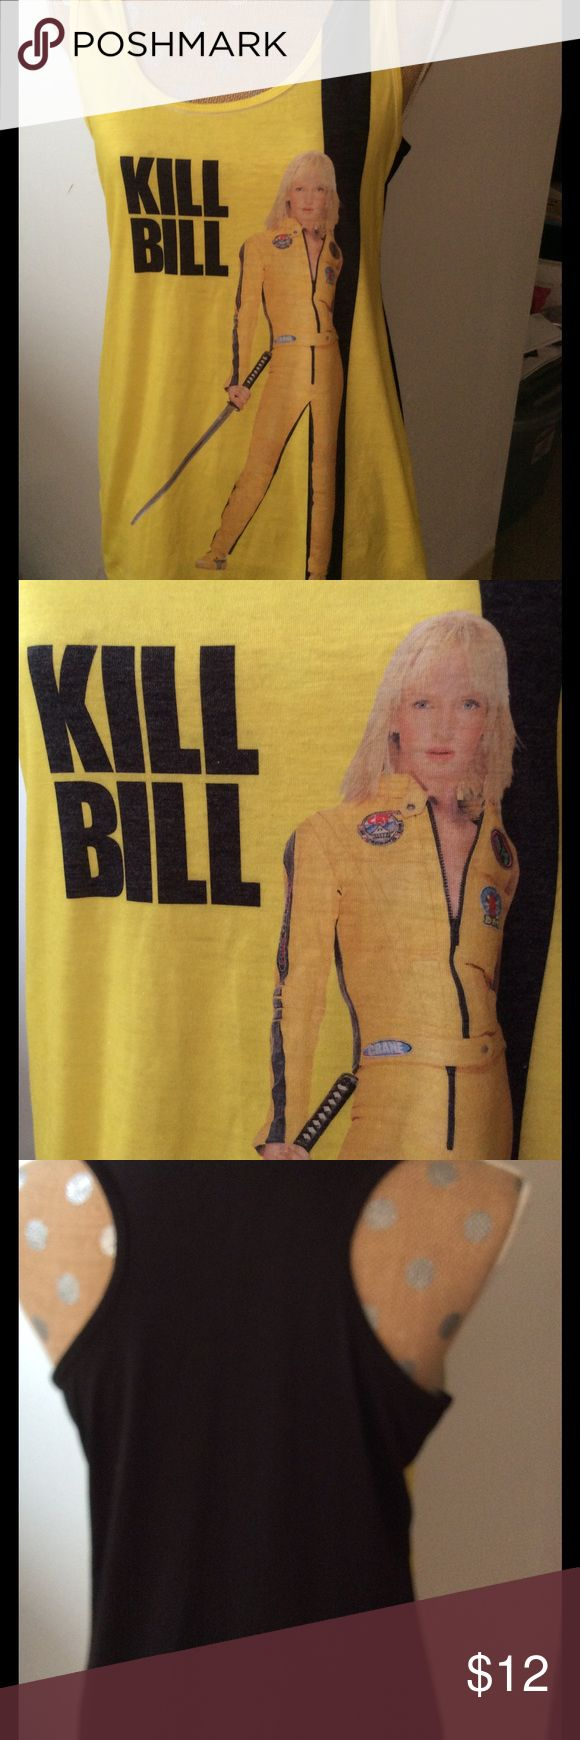 Kill Bill movie poster tank top Kill Bill movie poster tank top depicting Uma Thurman as Black Mamba. 88% polyester, 8% rayon, 4% spandex. Goodie two sleeves Tops Tank Tops